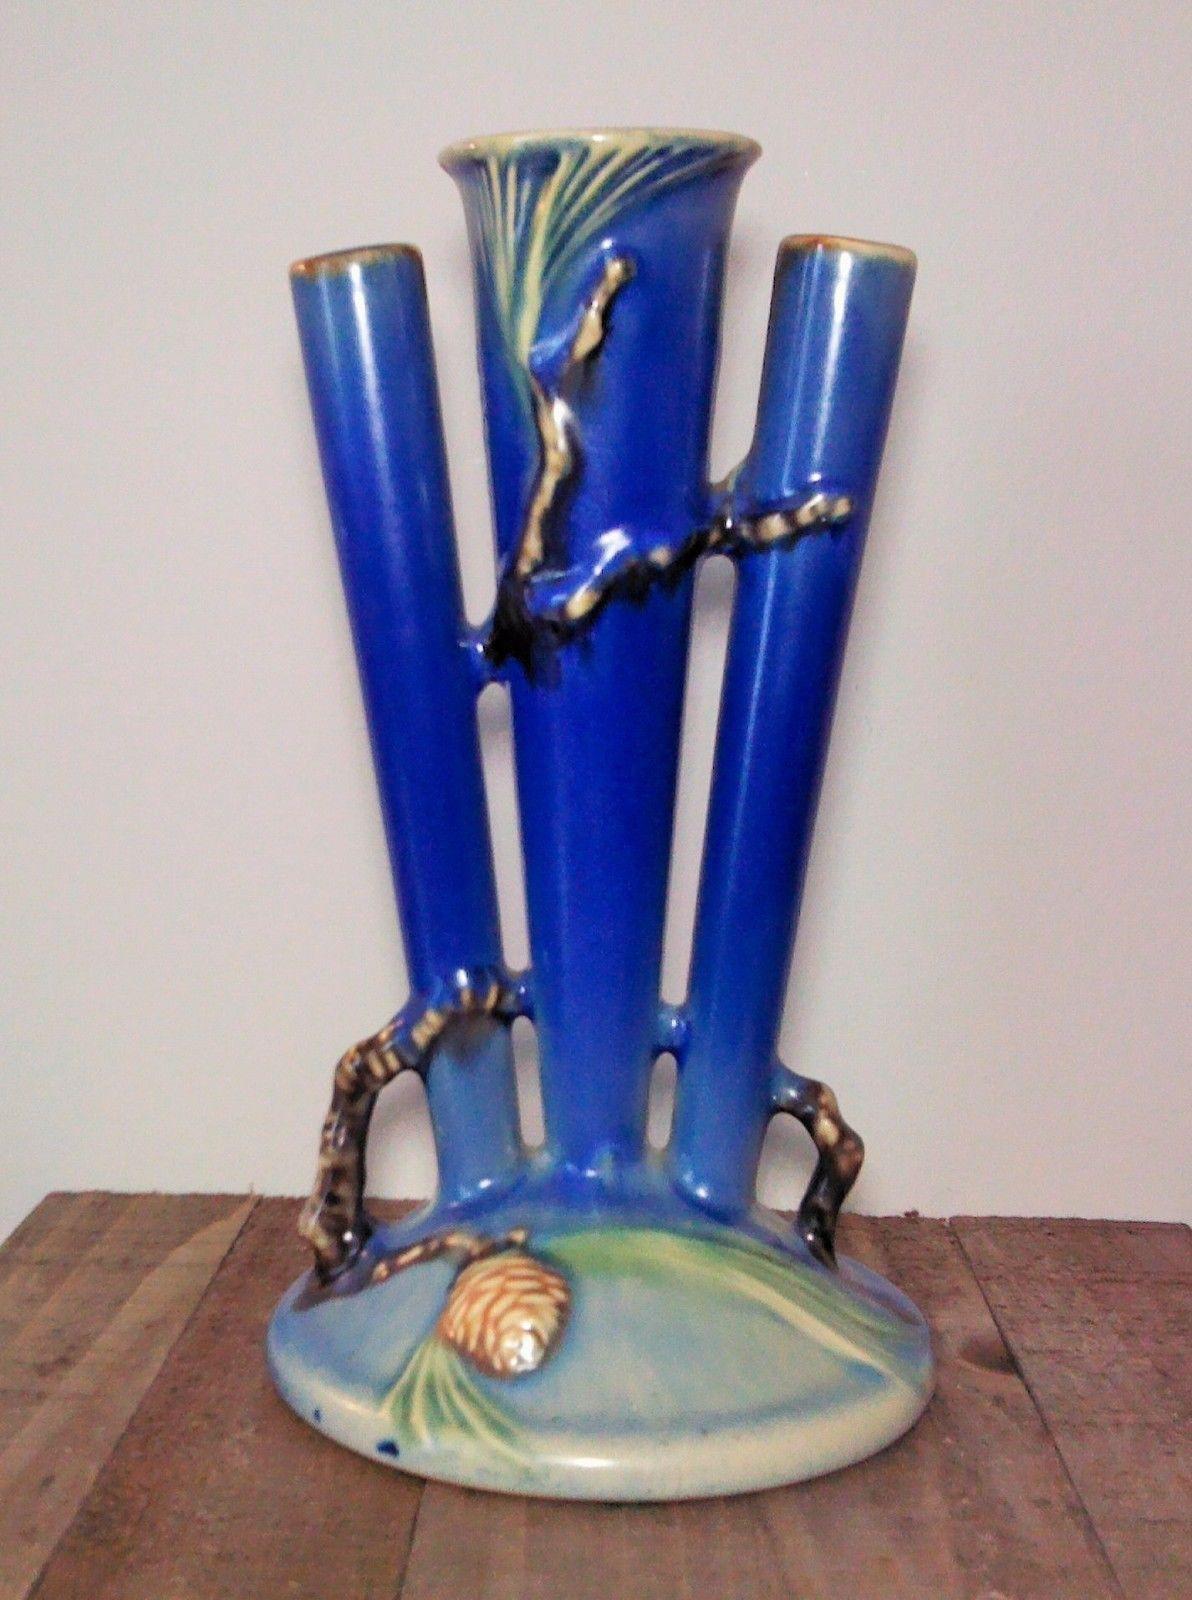 roseville water lily vase of blue bud vase stock rare roseville blue pine cone triple bud vase for blue bud vase stock rare roseville blue pine cone triple bud vase 113 8 near mint